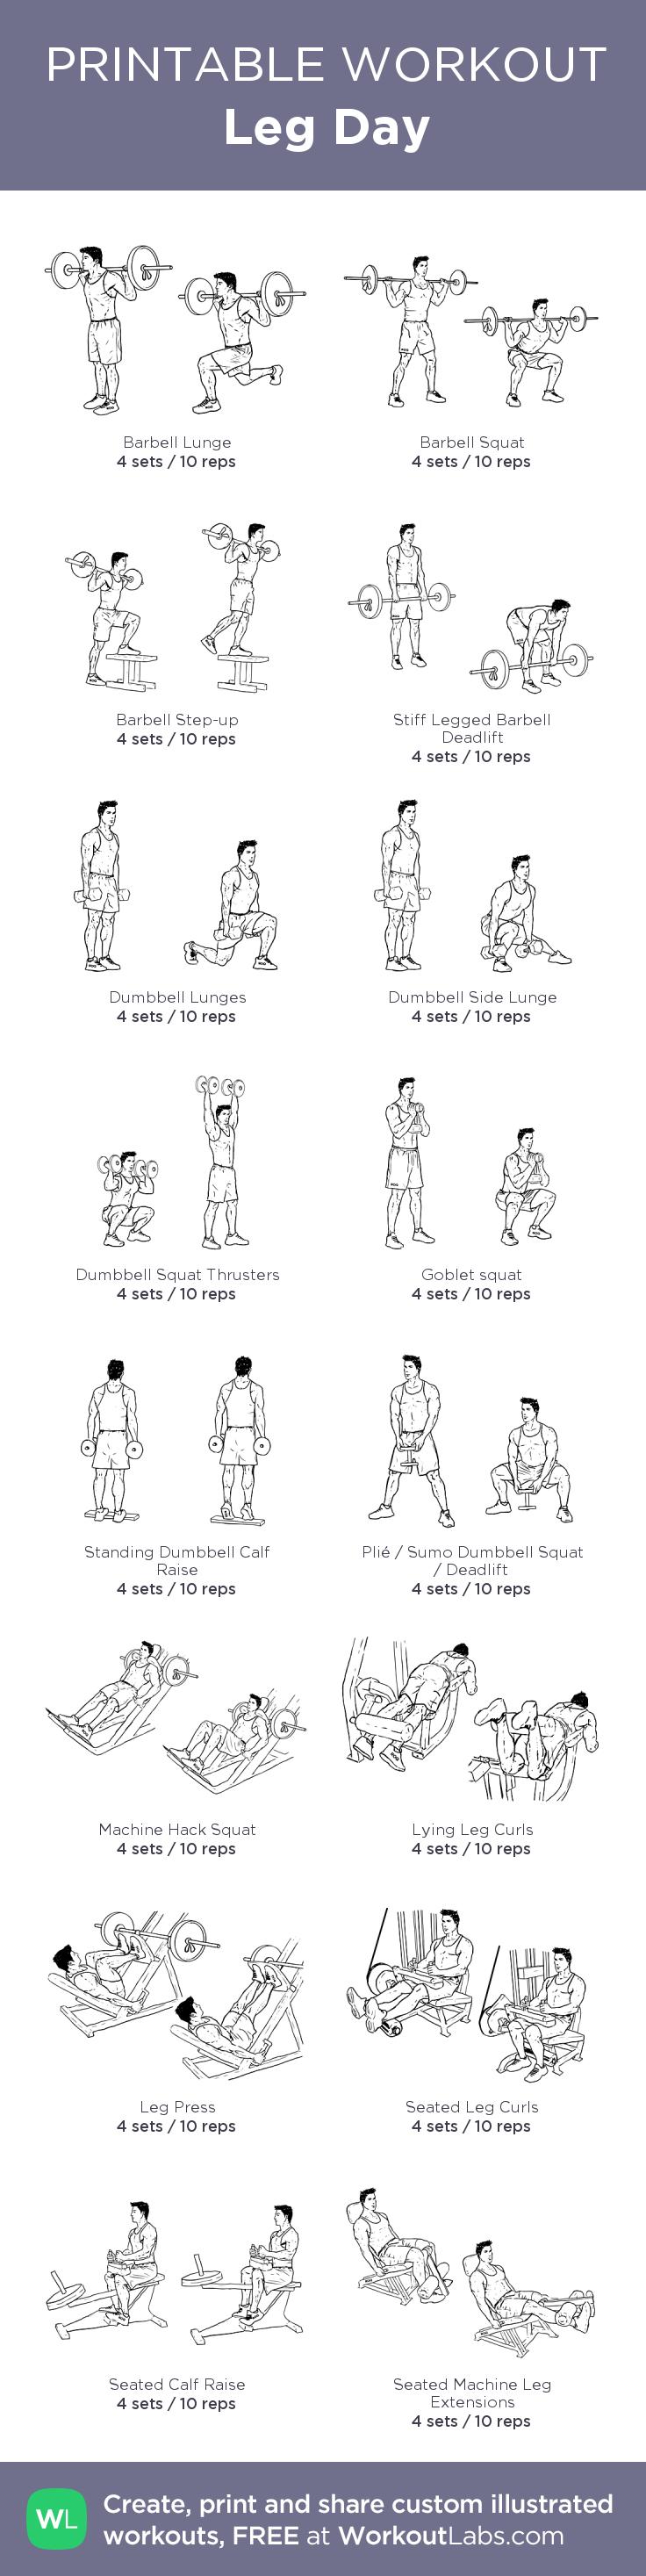 Leg Day: my custom printable workout by @WorkoutLabs